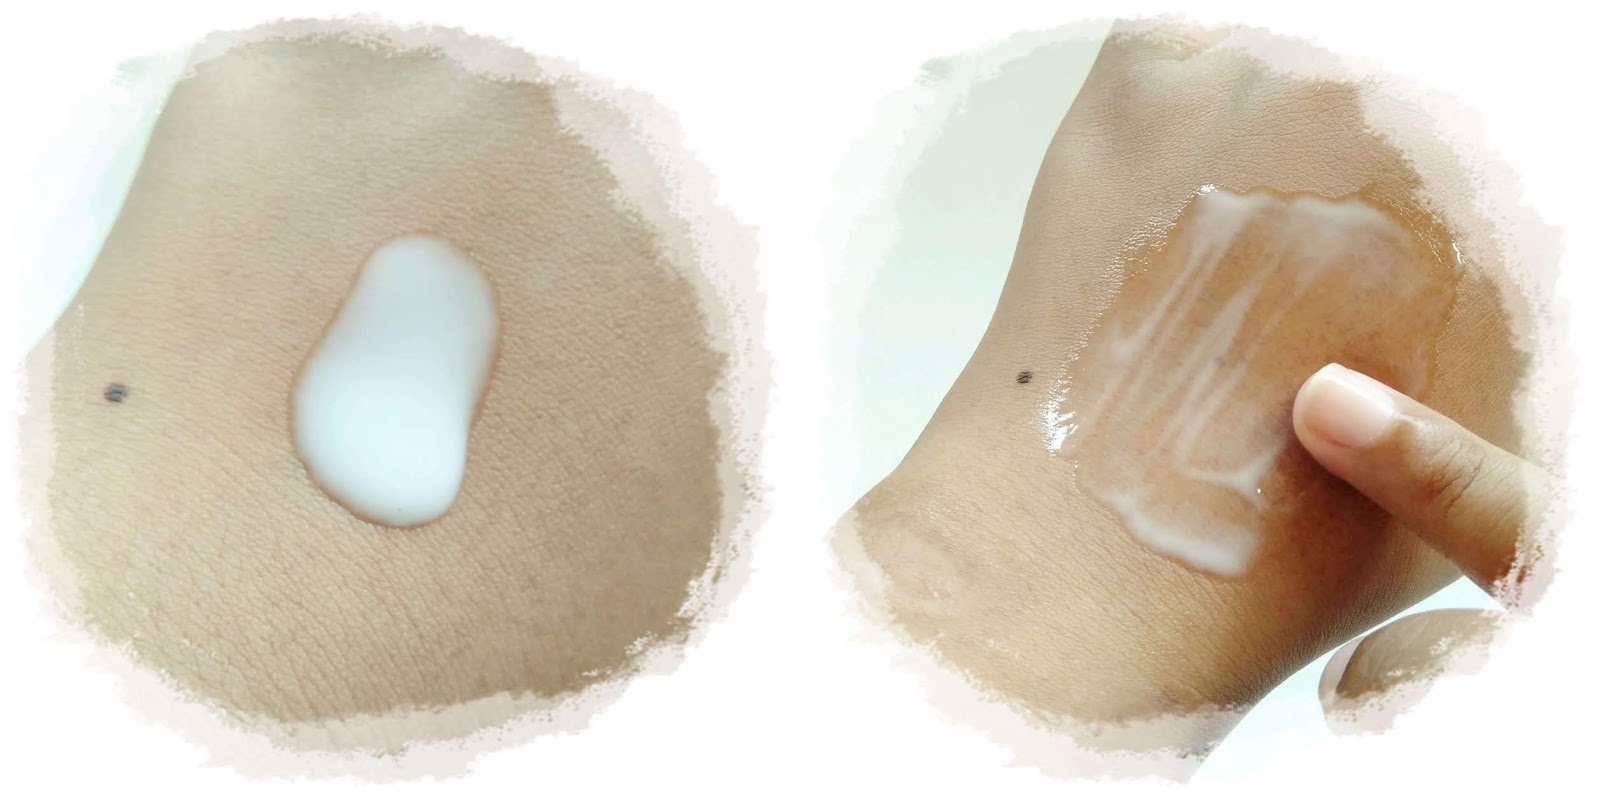 acwell-betaglution-ultra-moisture-milk-oil